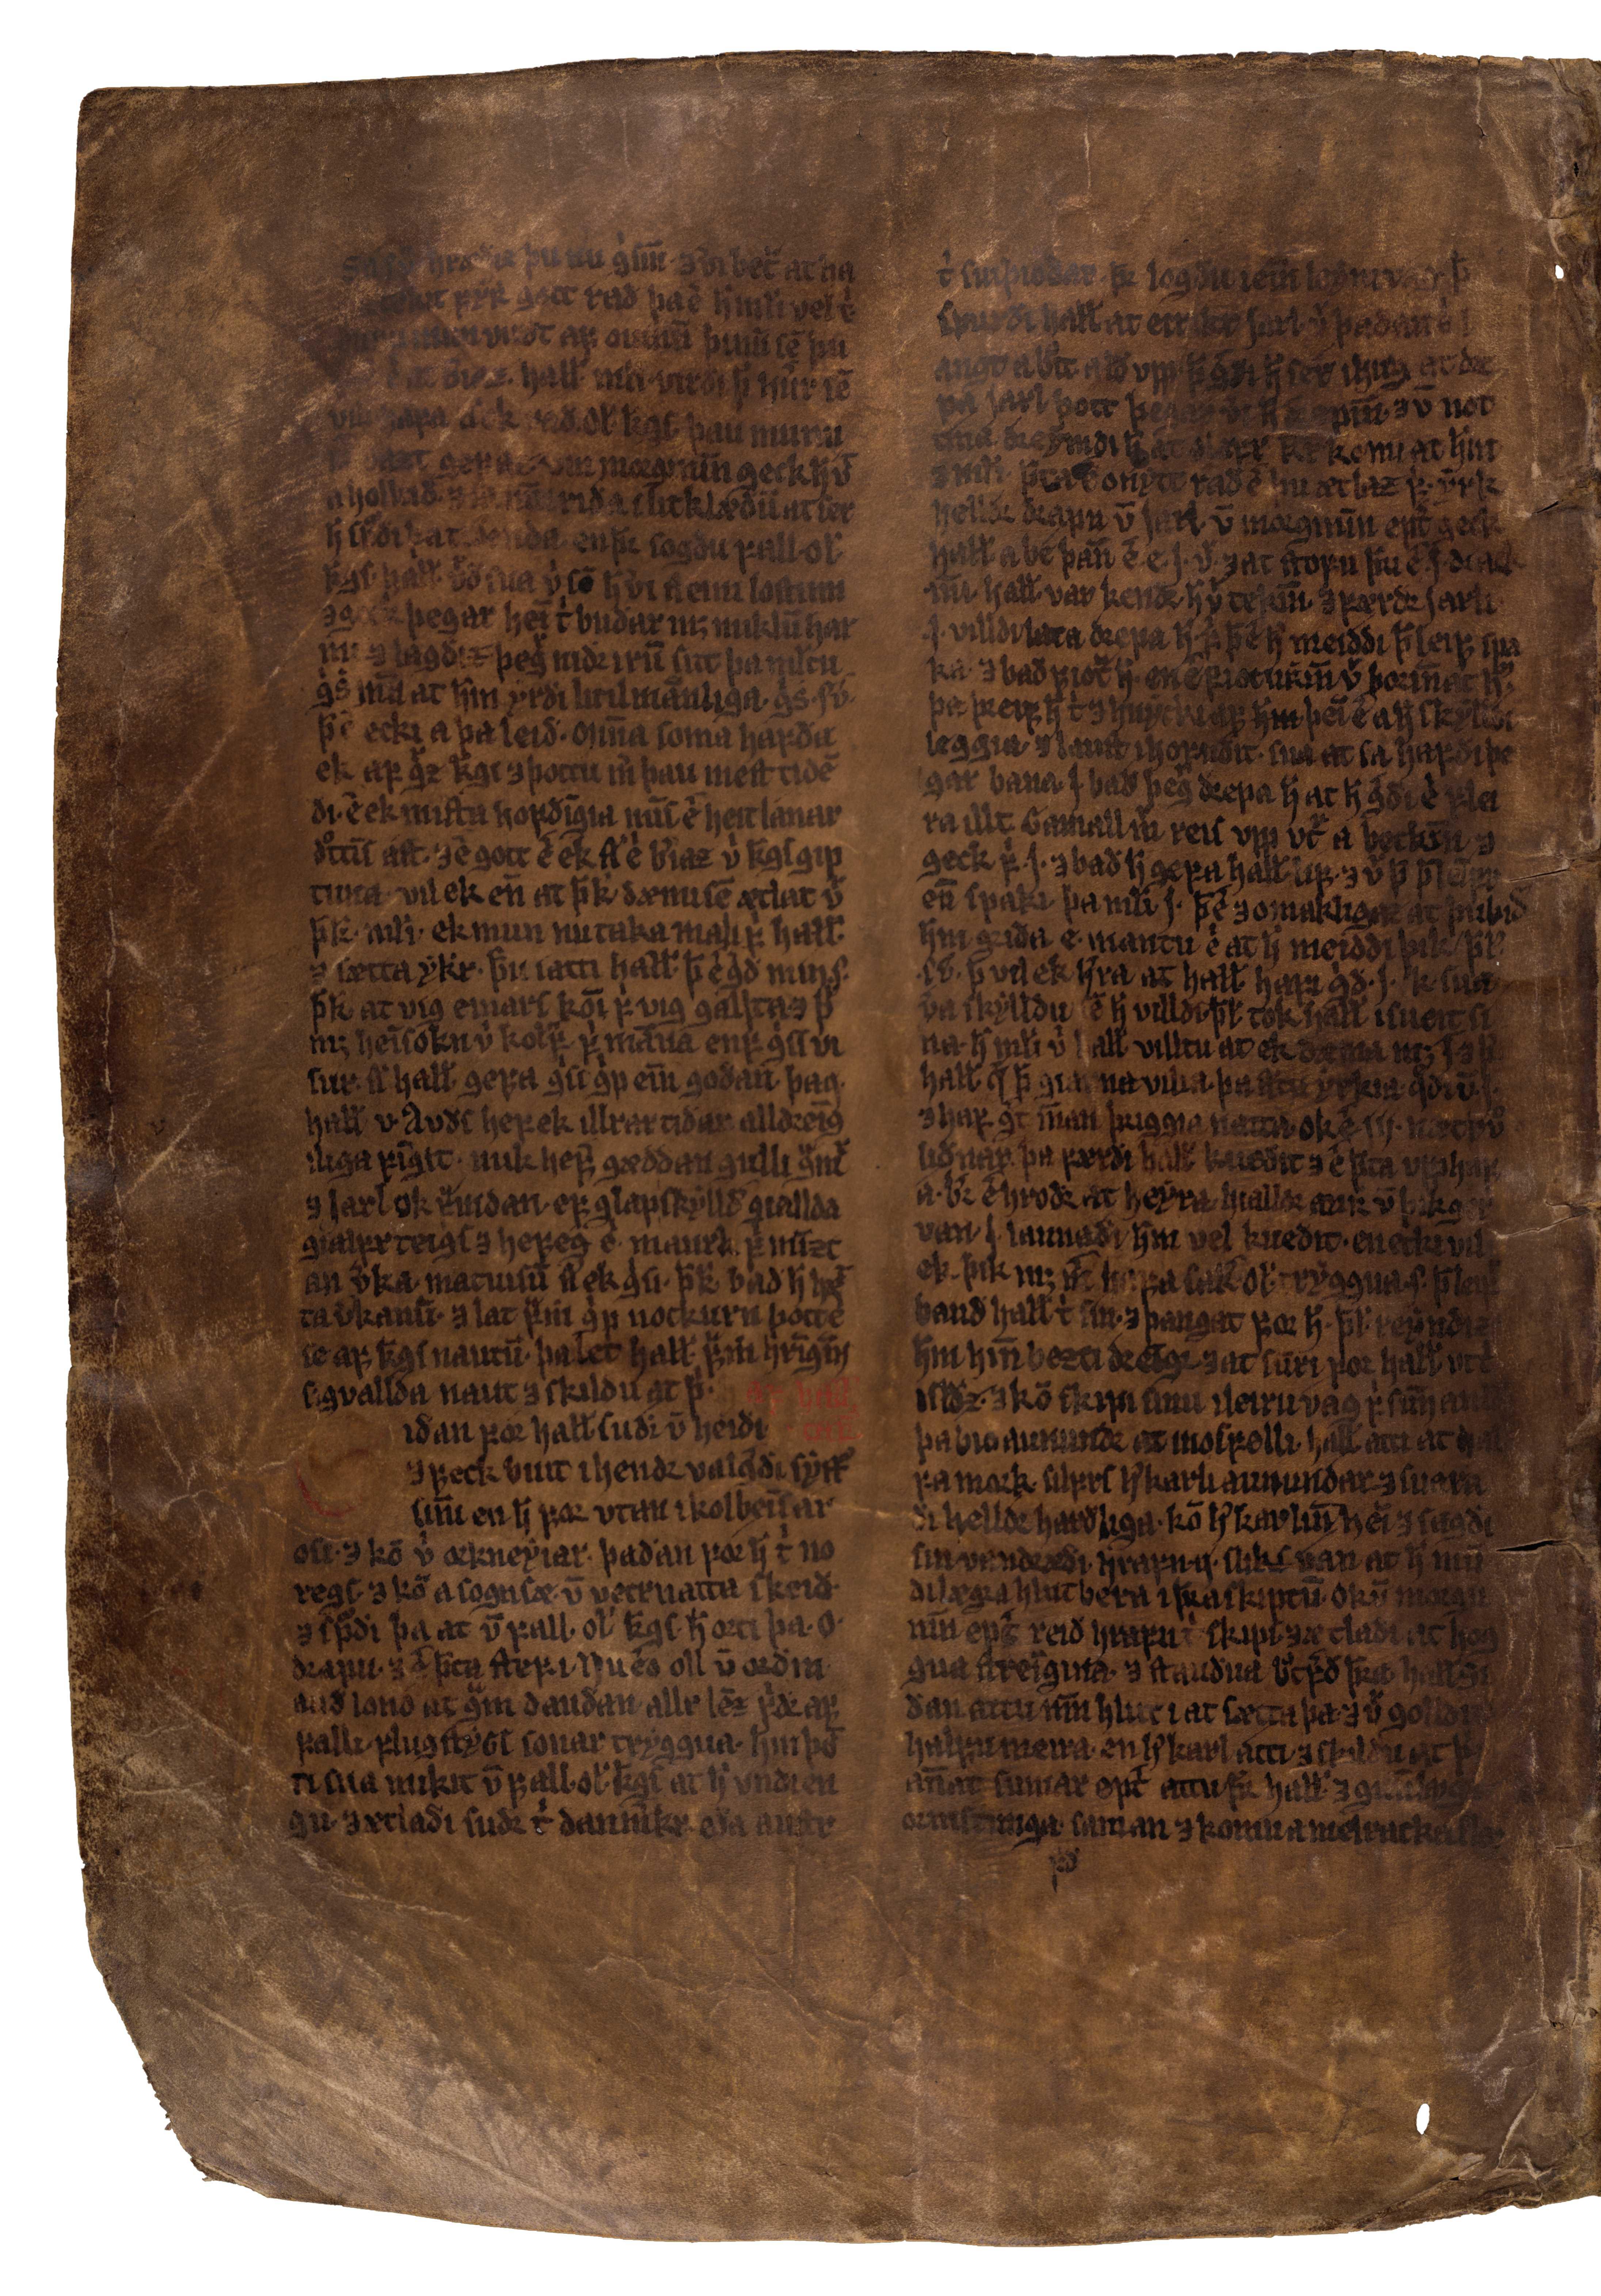 AM 132 fol - 155v